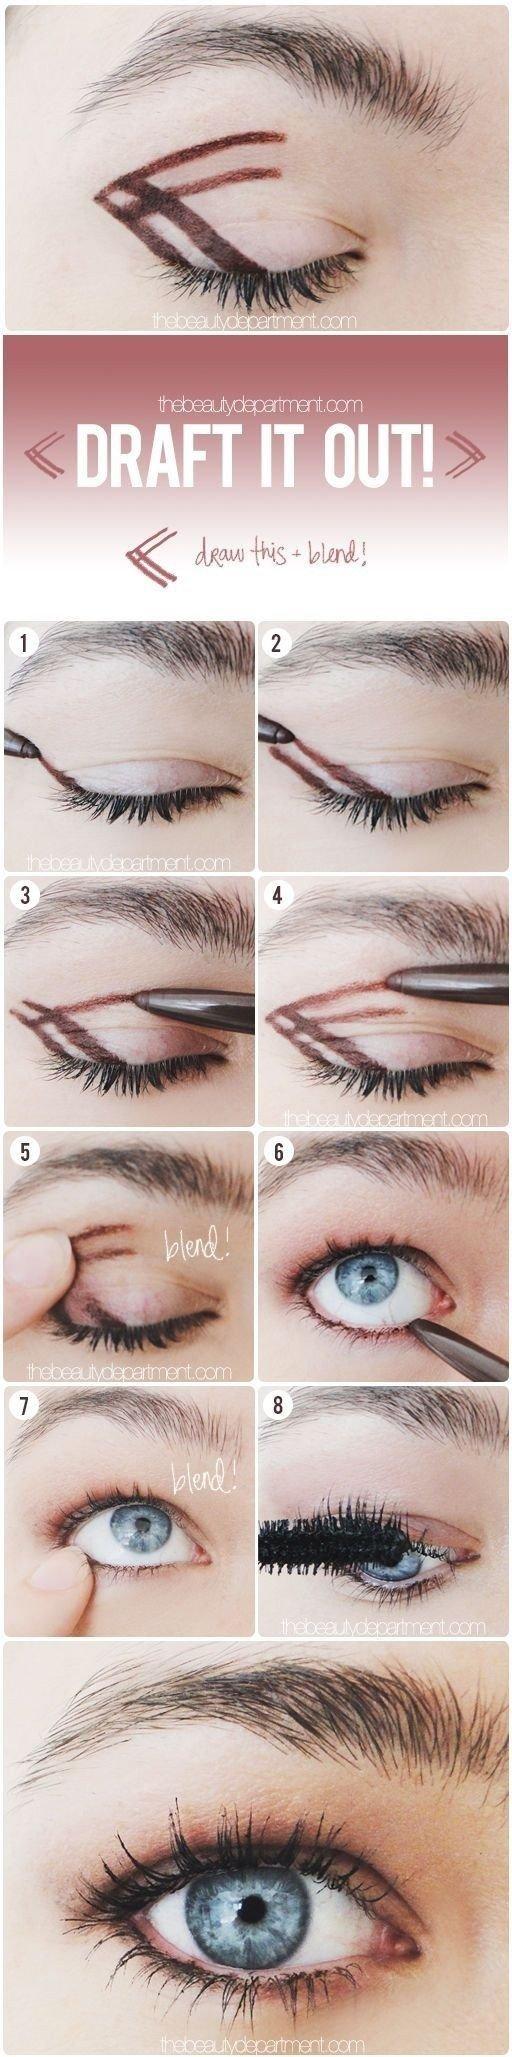 color,eyebrow,face,eyelash,eye,